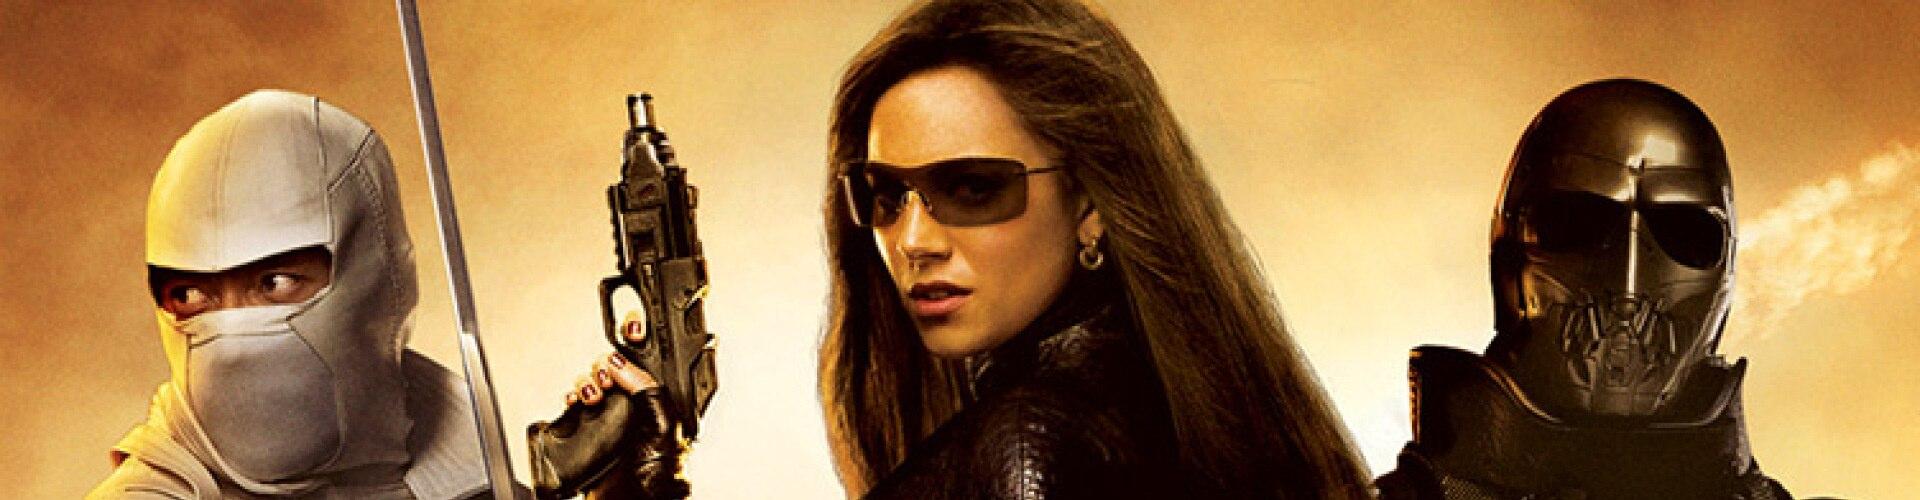 Watch G.I. Joe: The Rise Of Cobra Online